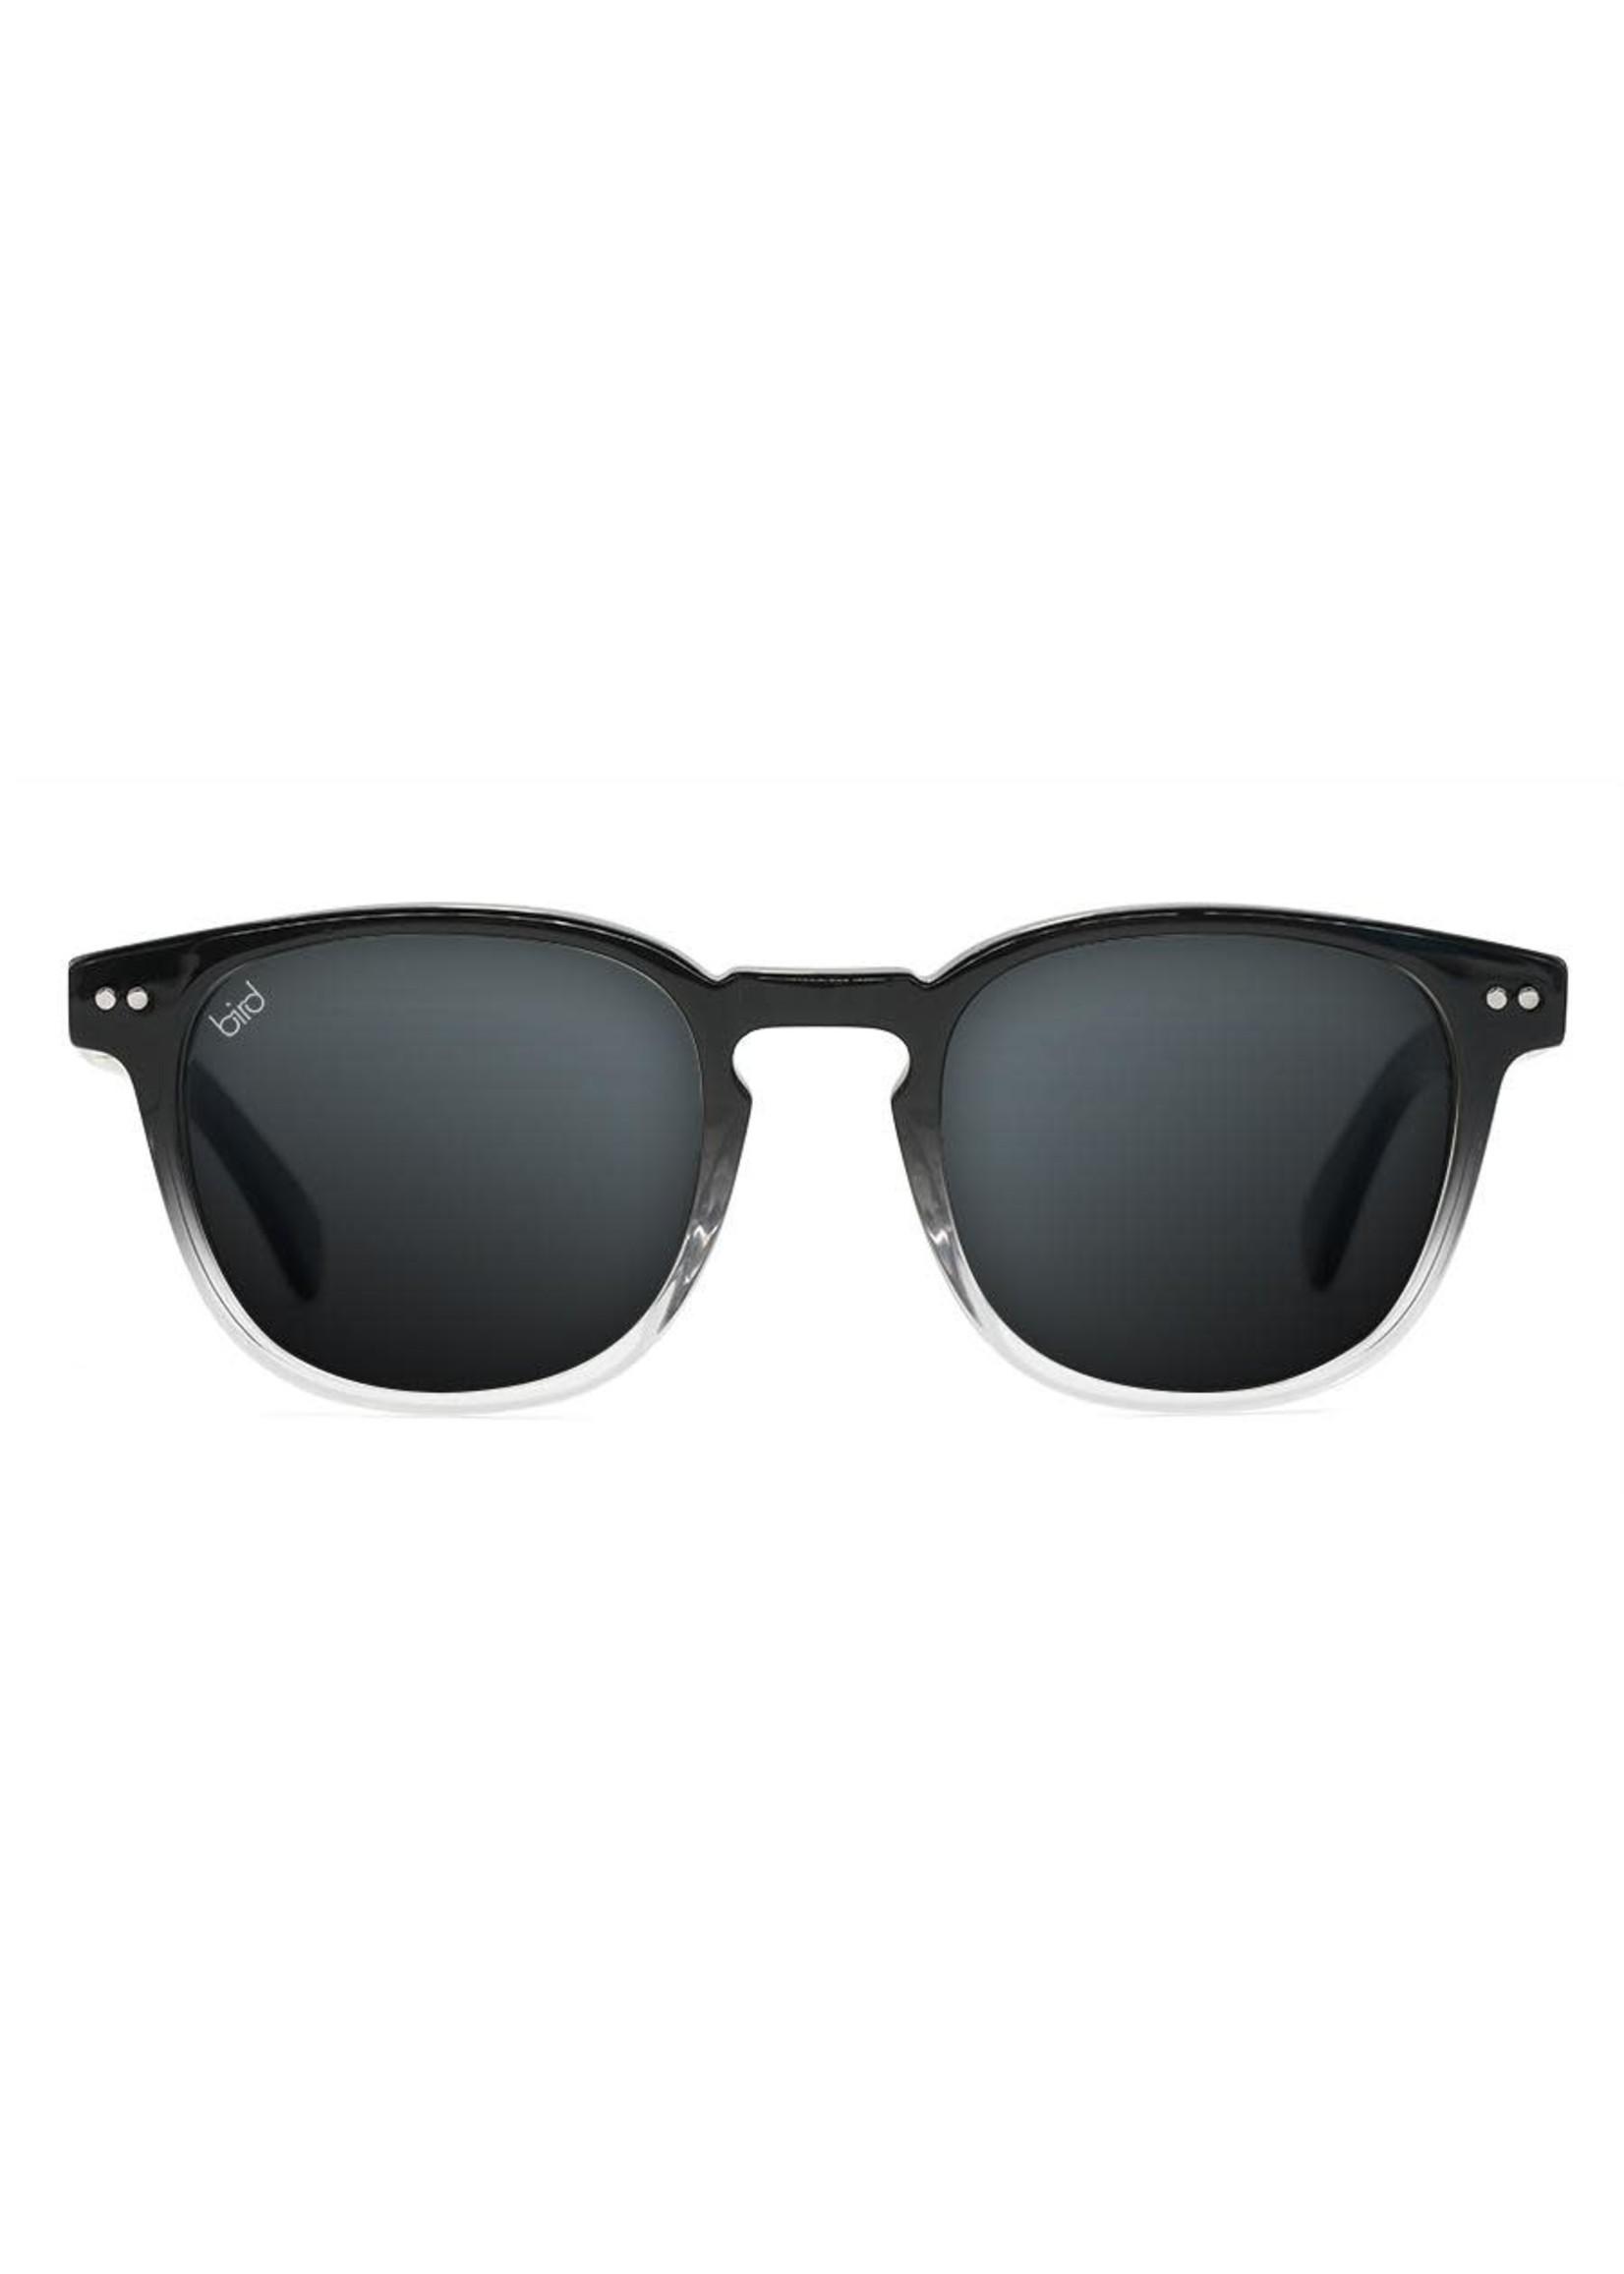 Bird Eyewear Bird Athene Sunglasses - Two Tone